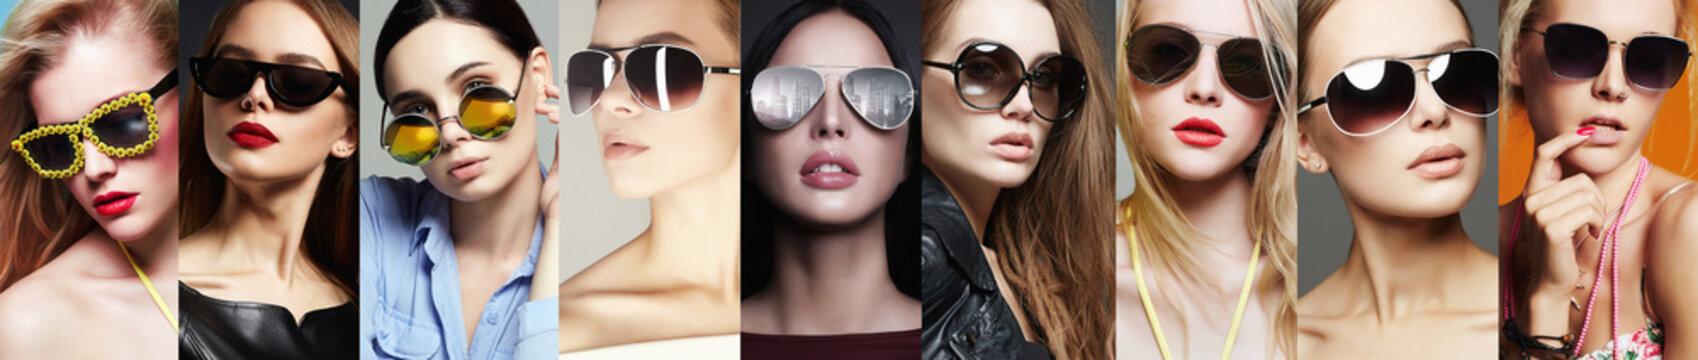 Beauty Fashion collage. Women in Sunglasses